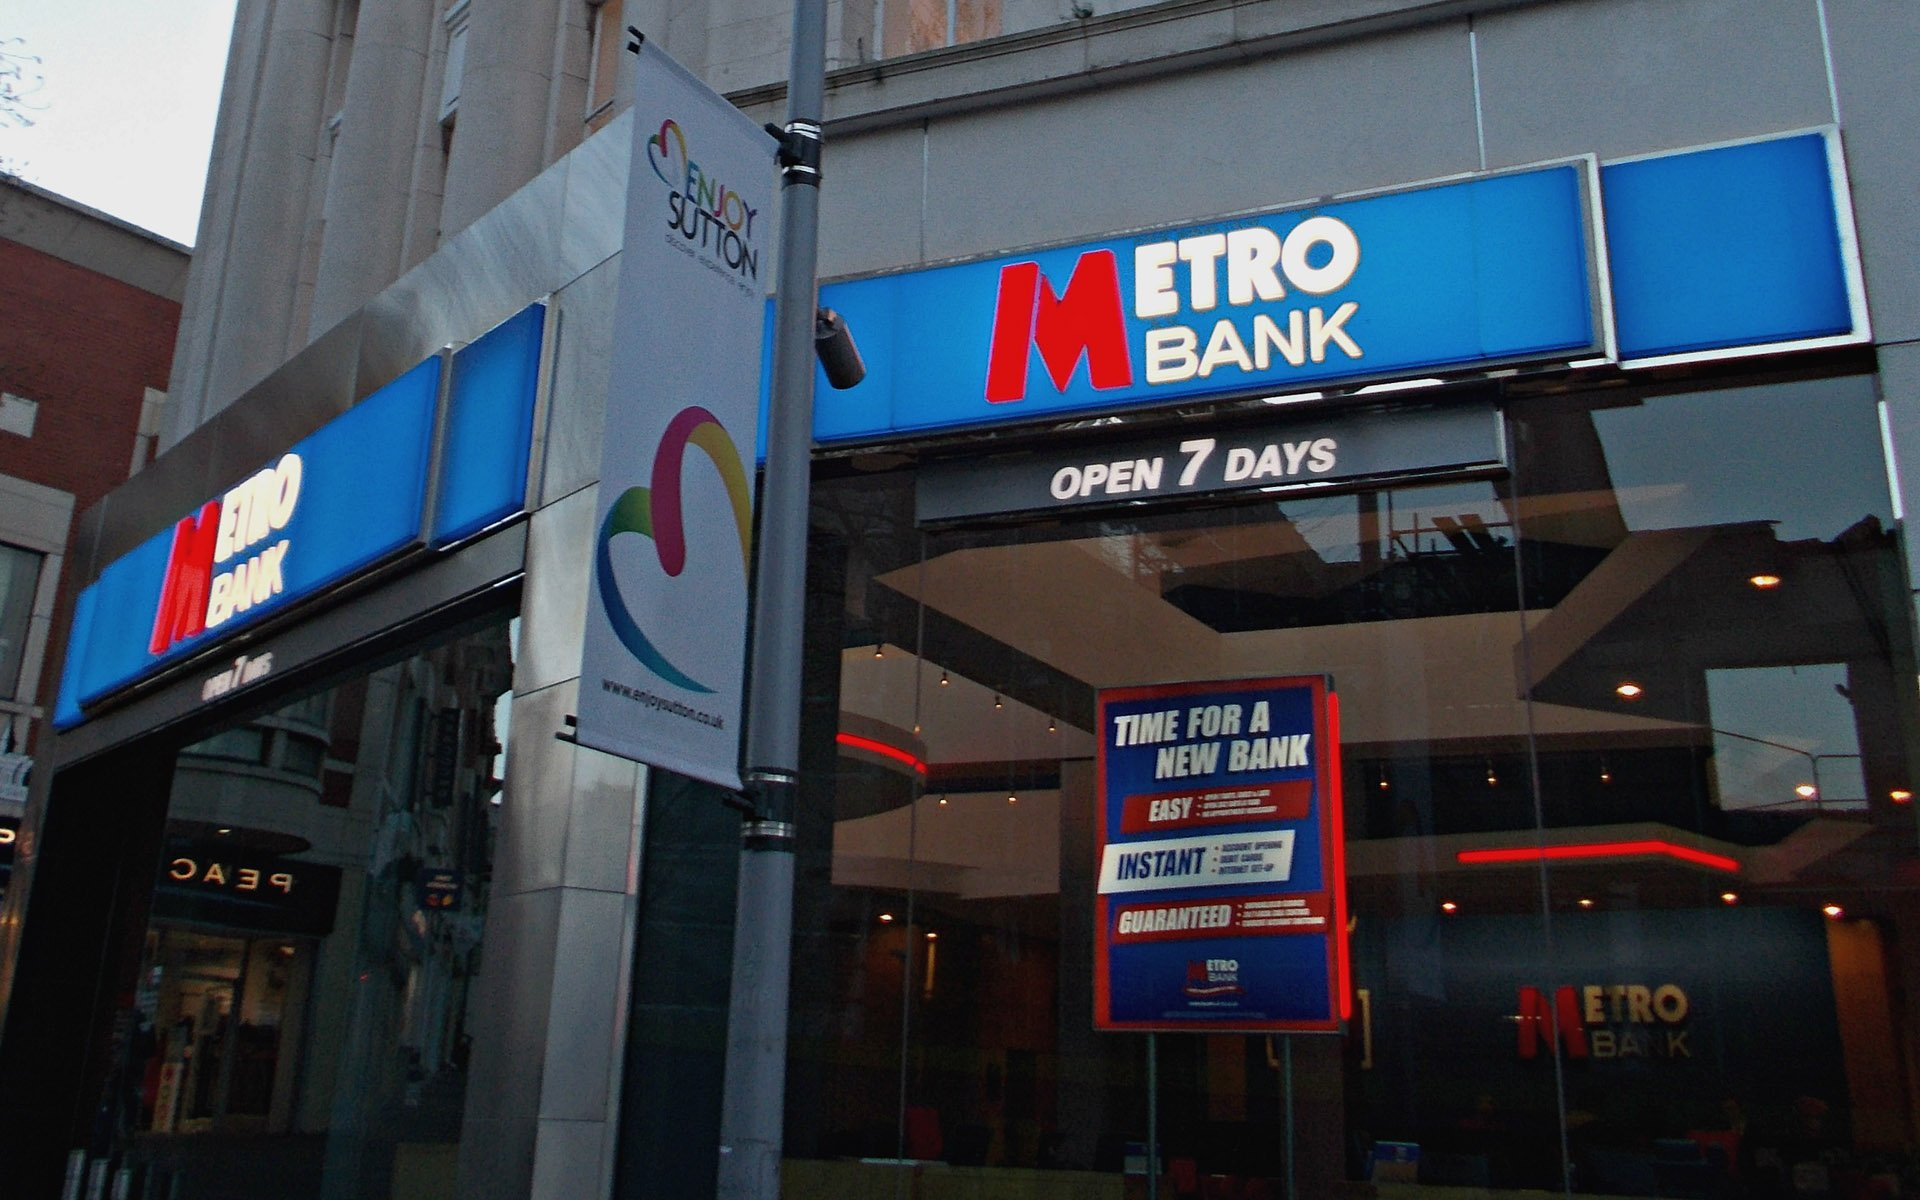 Metropolitan Bank Halting CryptocurrencyRelated Transfers